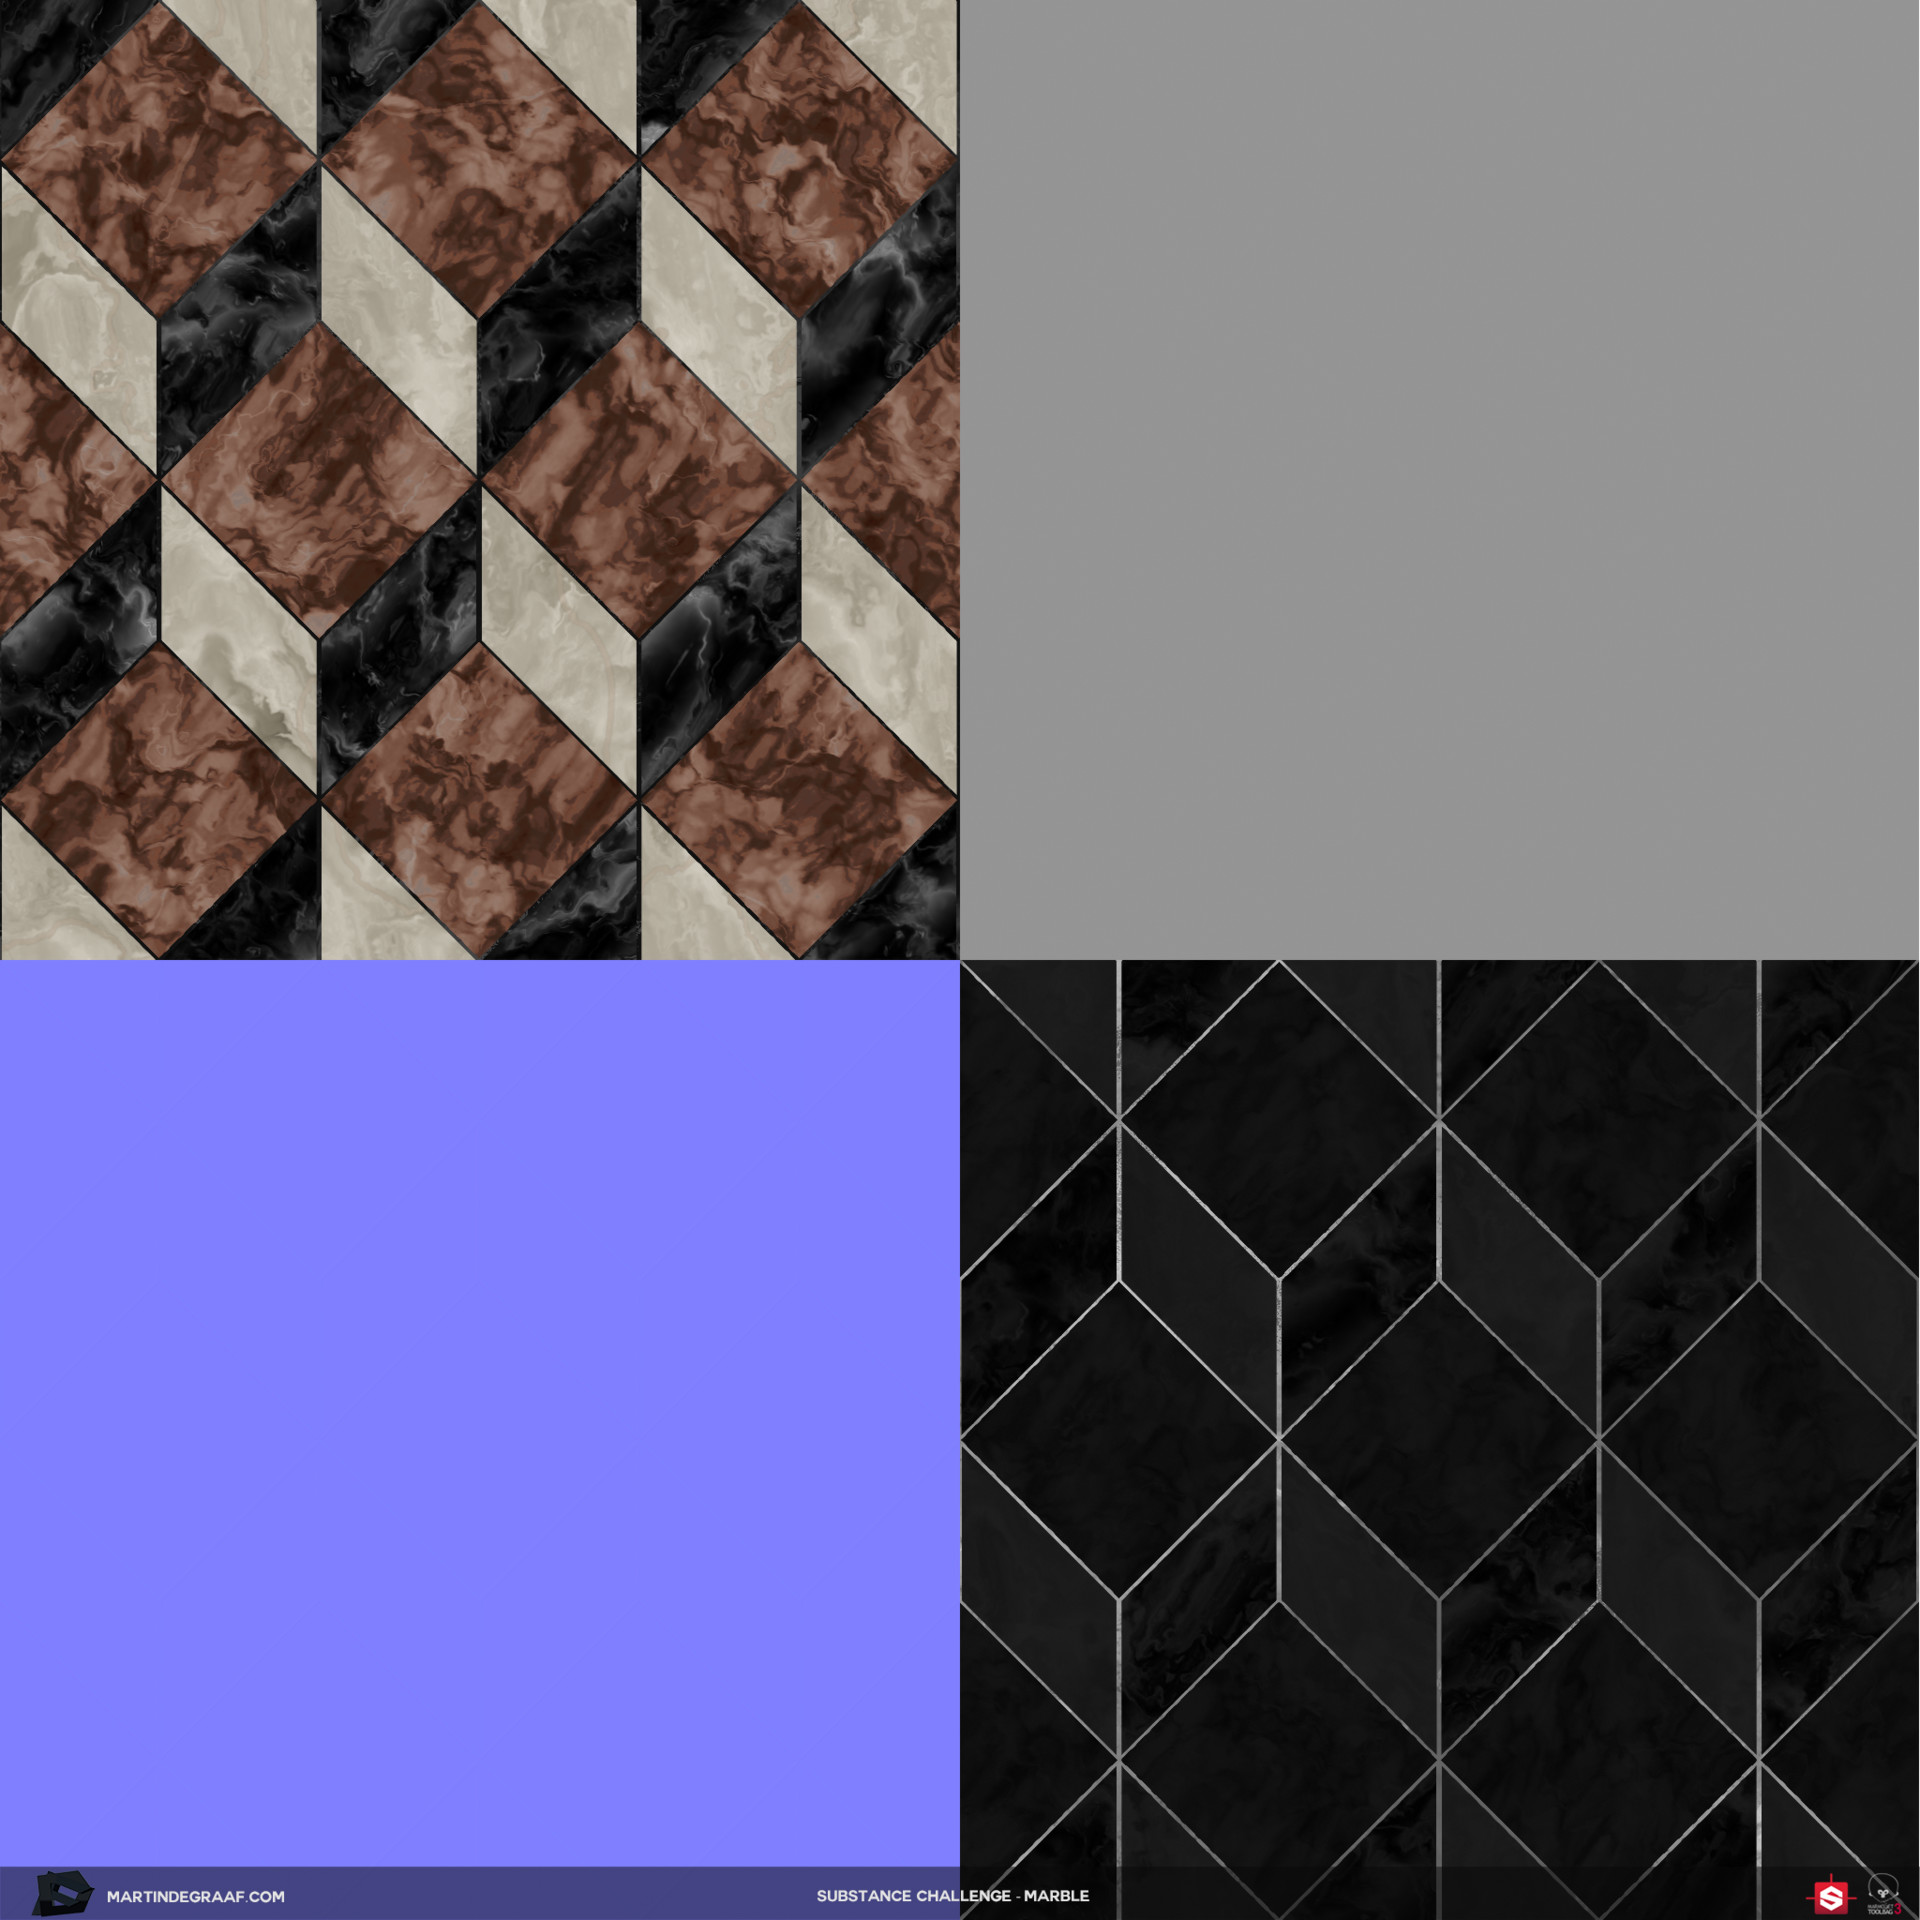 Martin de graaf substance challenge marble substance texturesheet martin de graaf 2017